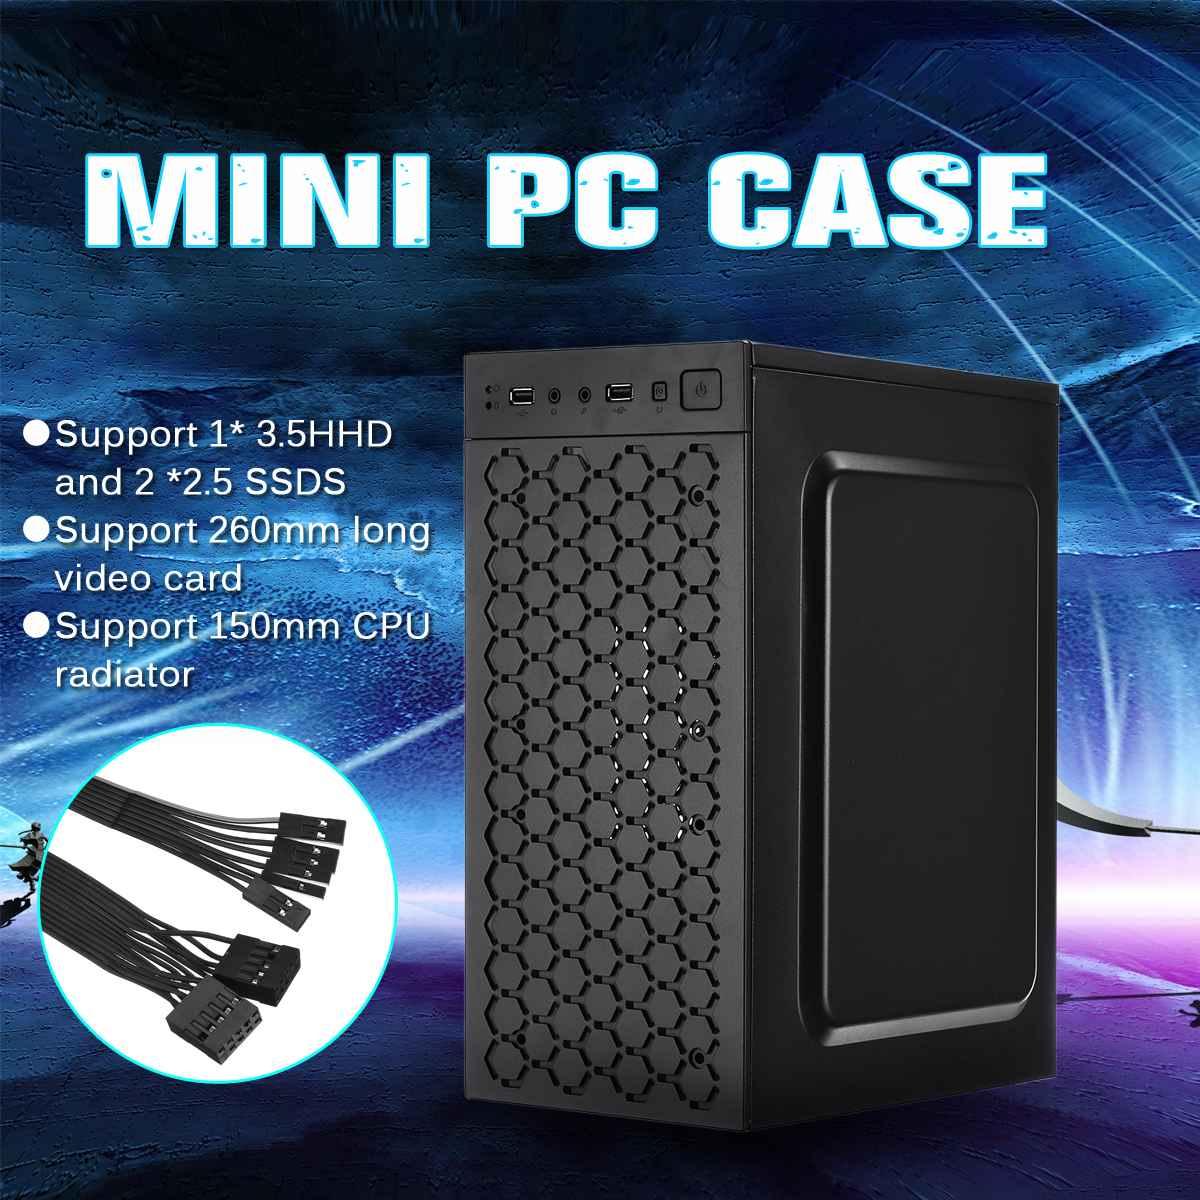 Mini funda USB2.0 chasis soporte 3.5HHD 2,5 SSDS CPU radiador Compatible con Micro/ITX Motherboard chasis de ordenador